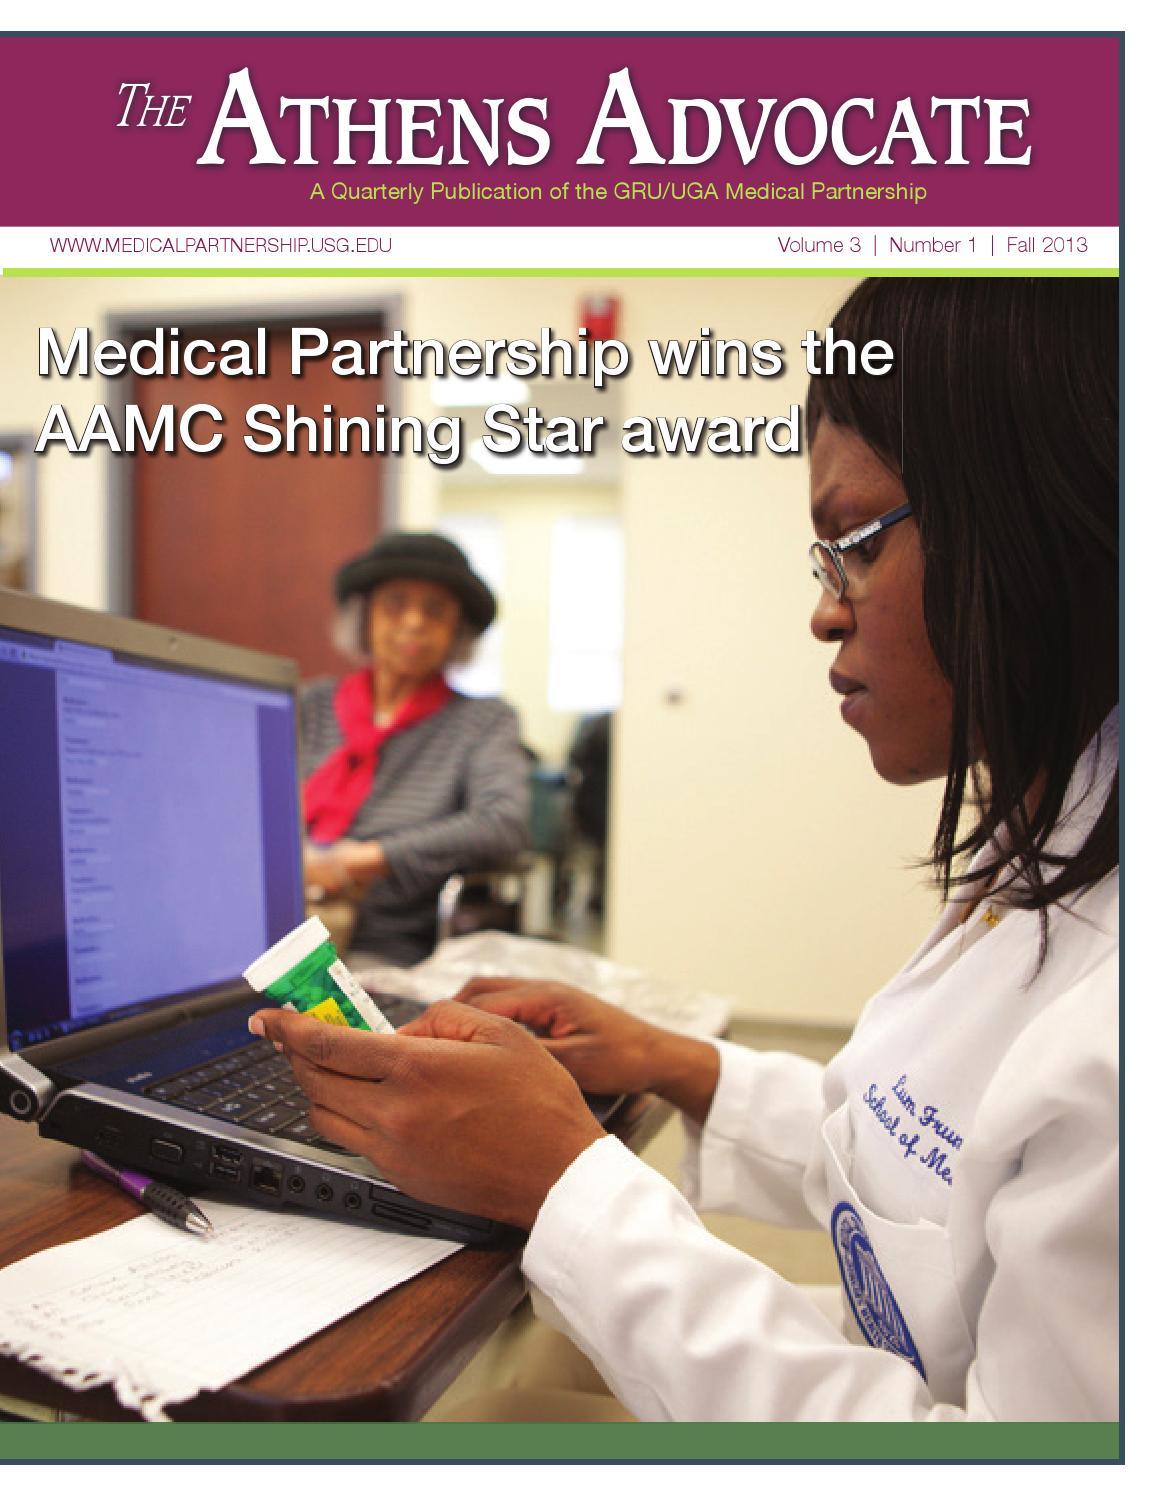 Athens Advocate Fall 2013 by AU UGA Medical Partnership ...